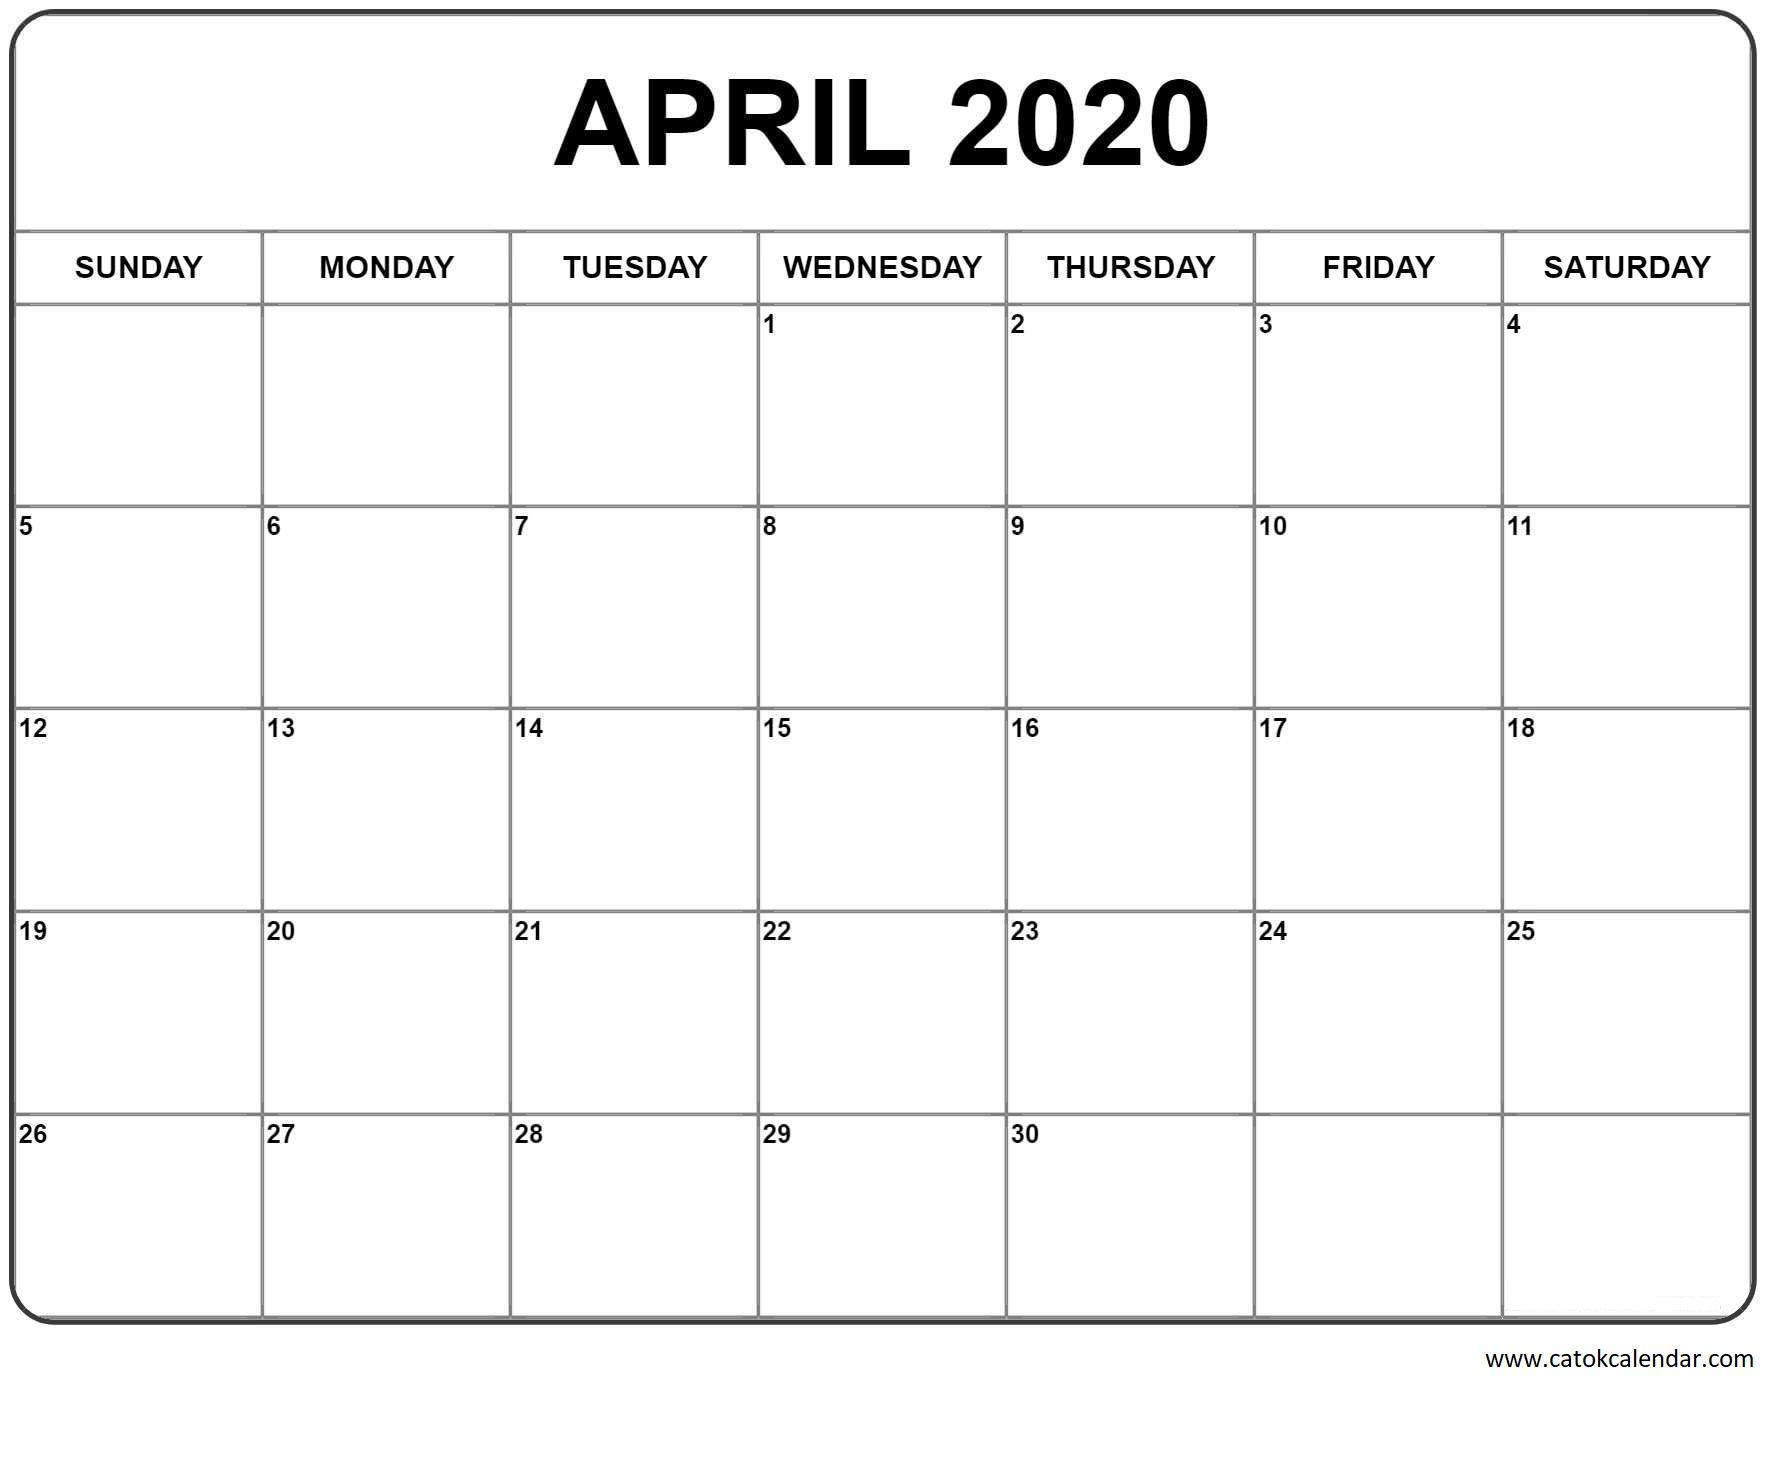 Printable Calendar 2020 – Free Printable Daily, Monthly With Regard To Julian Vs Gregorian Calendar 2021